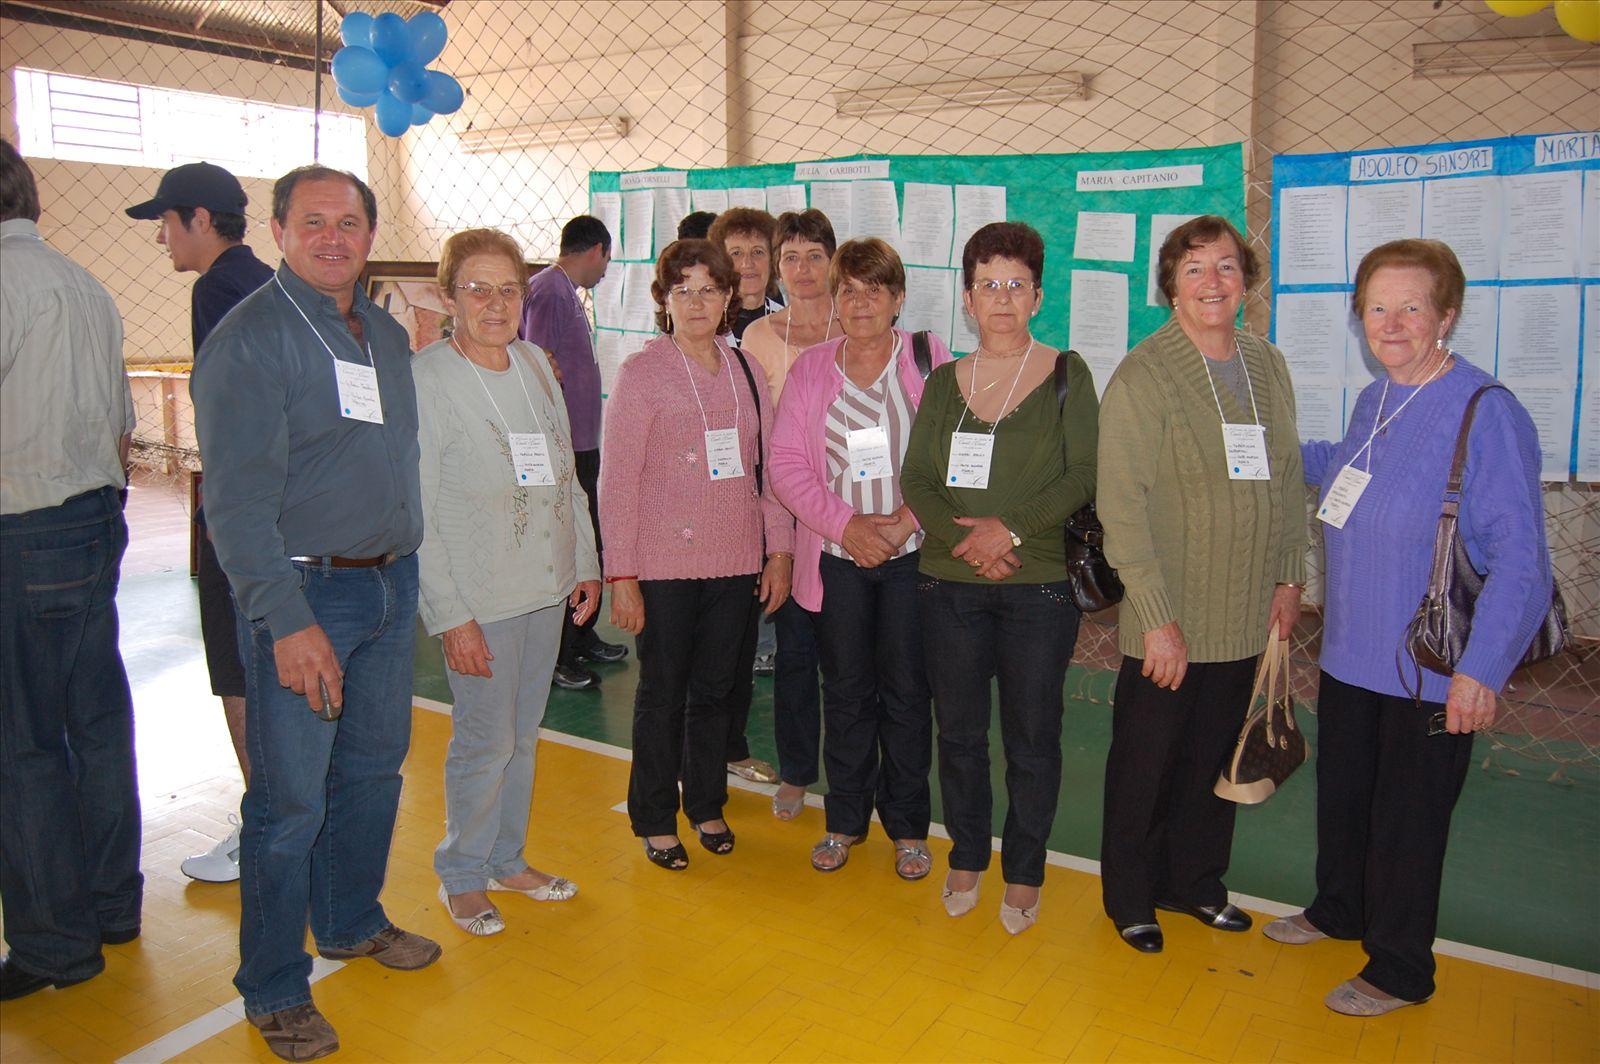 2º Encontro Família Cornelli - 11.10.2009 (62)_0